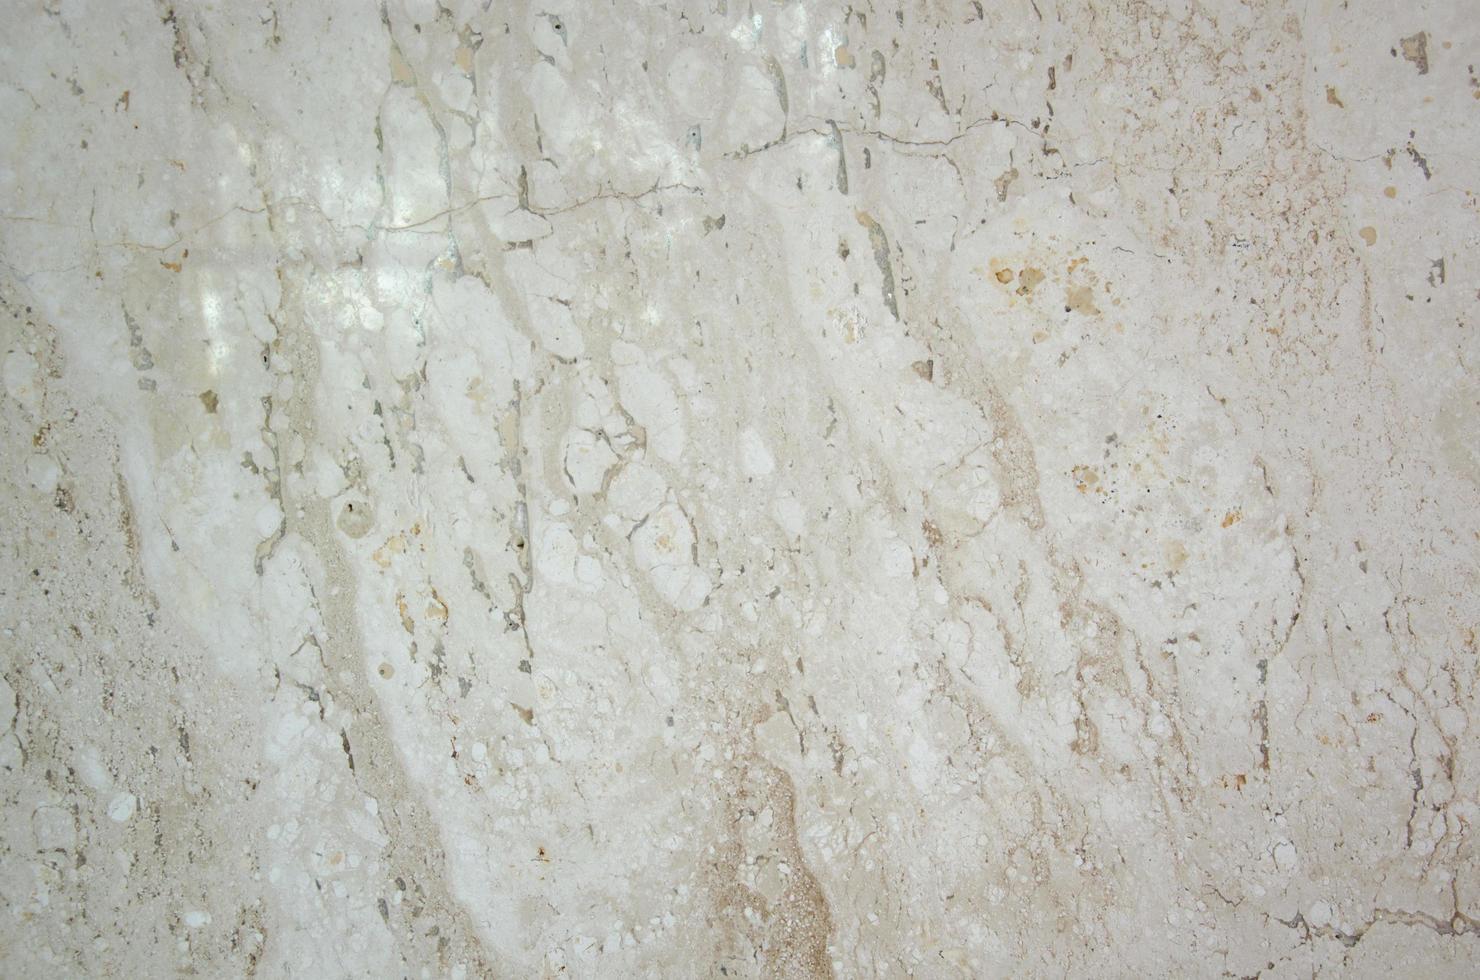 textura de mármore rústica foto